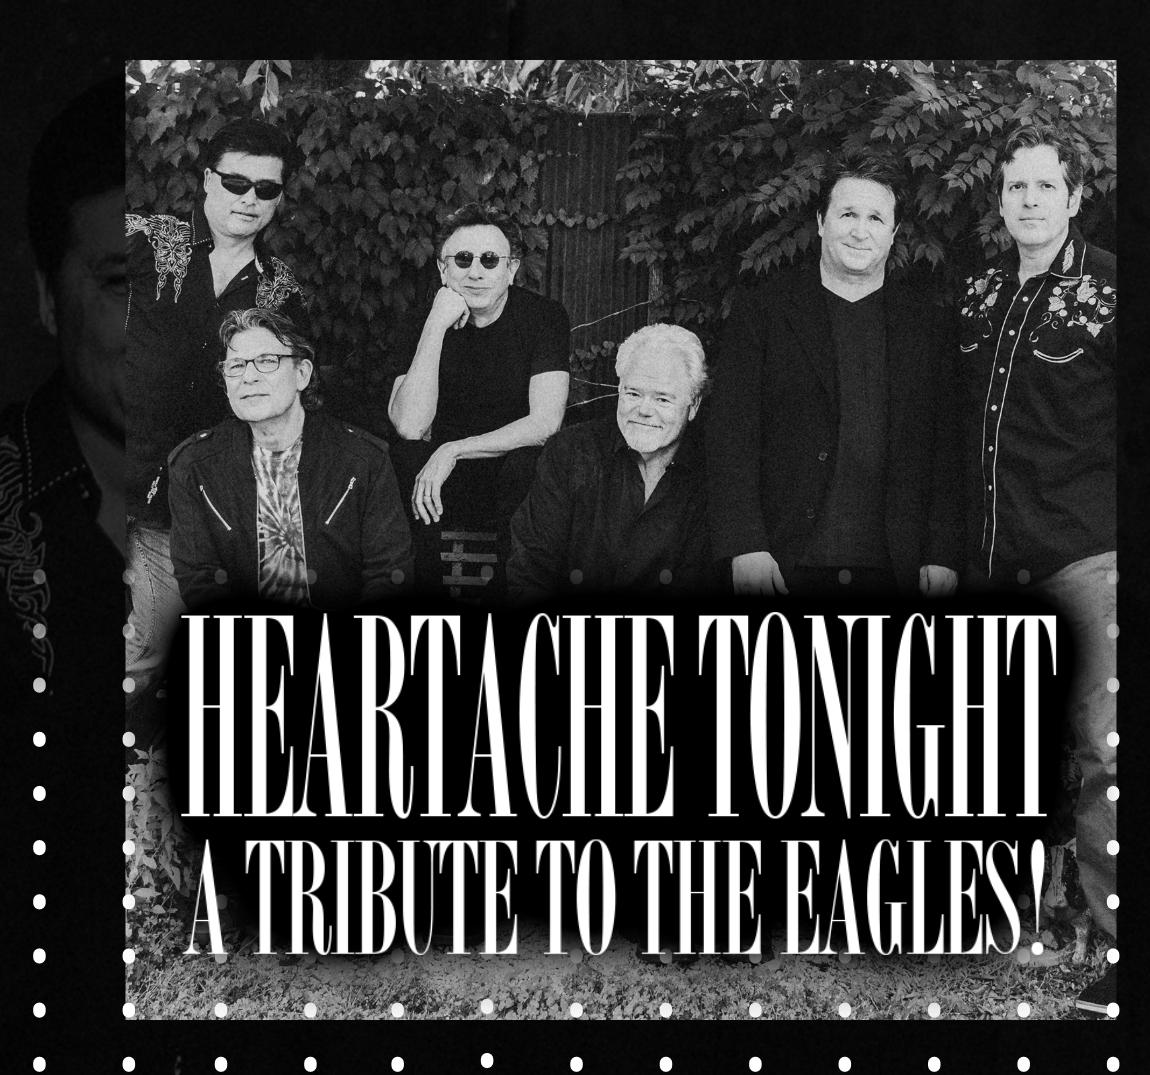 Eagles Tribute - Heartache Tonight show poster